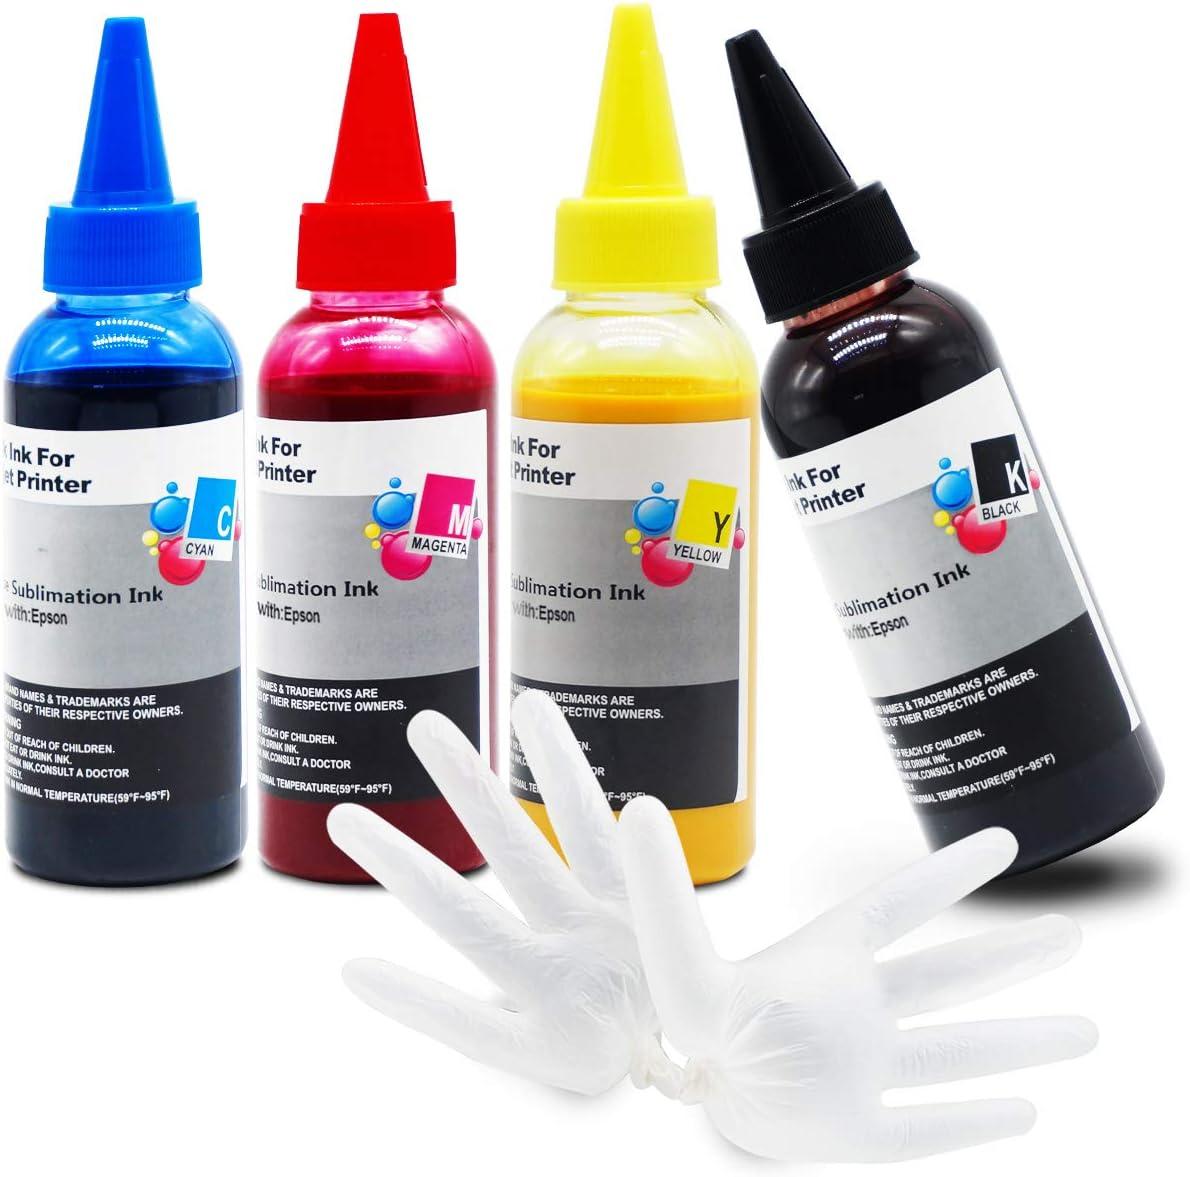 Anti-UV Sublimation Ink for Epson